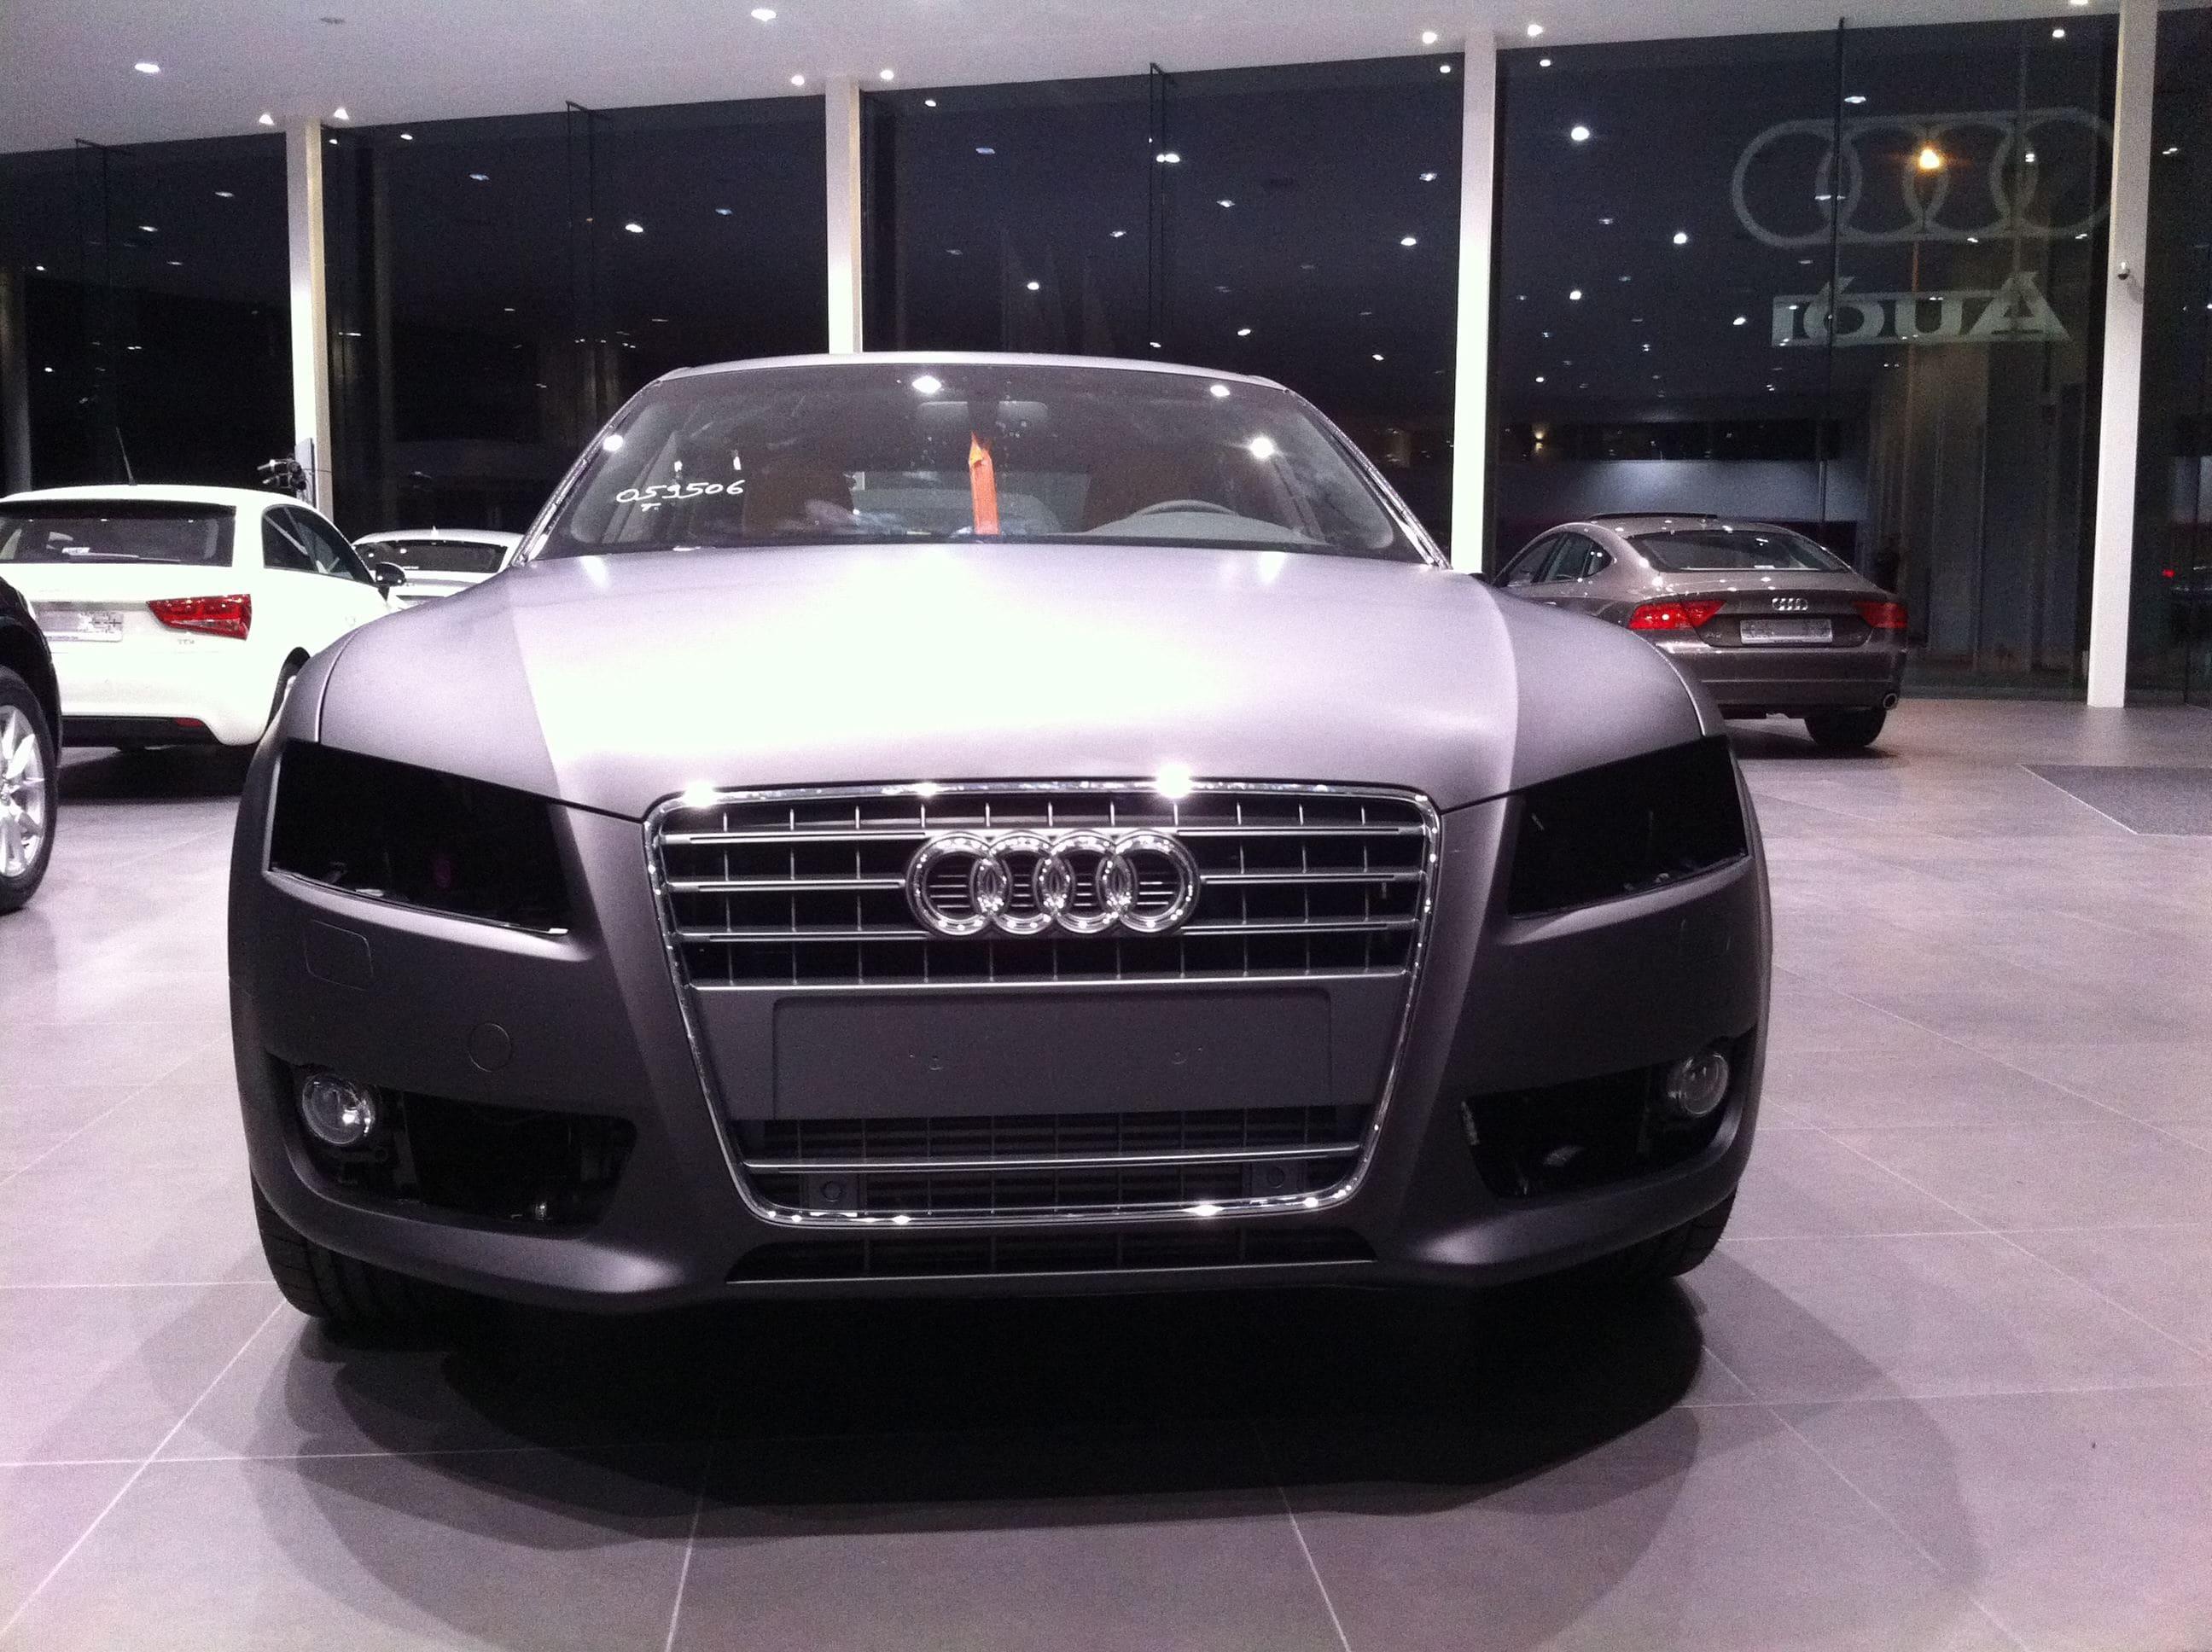 Audi A5 Sportback met Mat Grijze Wrap, Carwrapping door Wrapmyride.nu Foto-nr:4794, ©2021